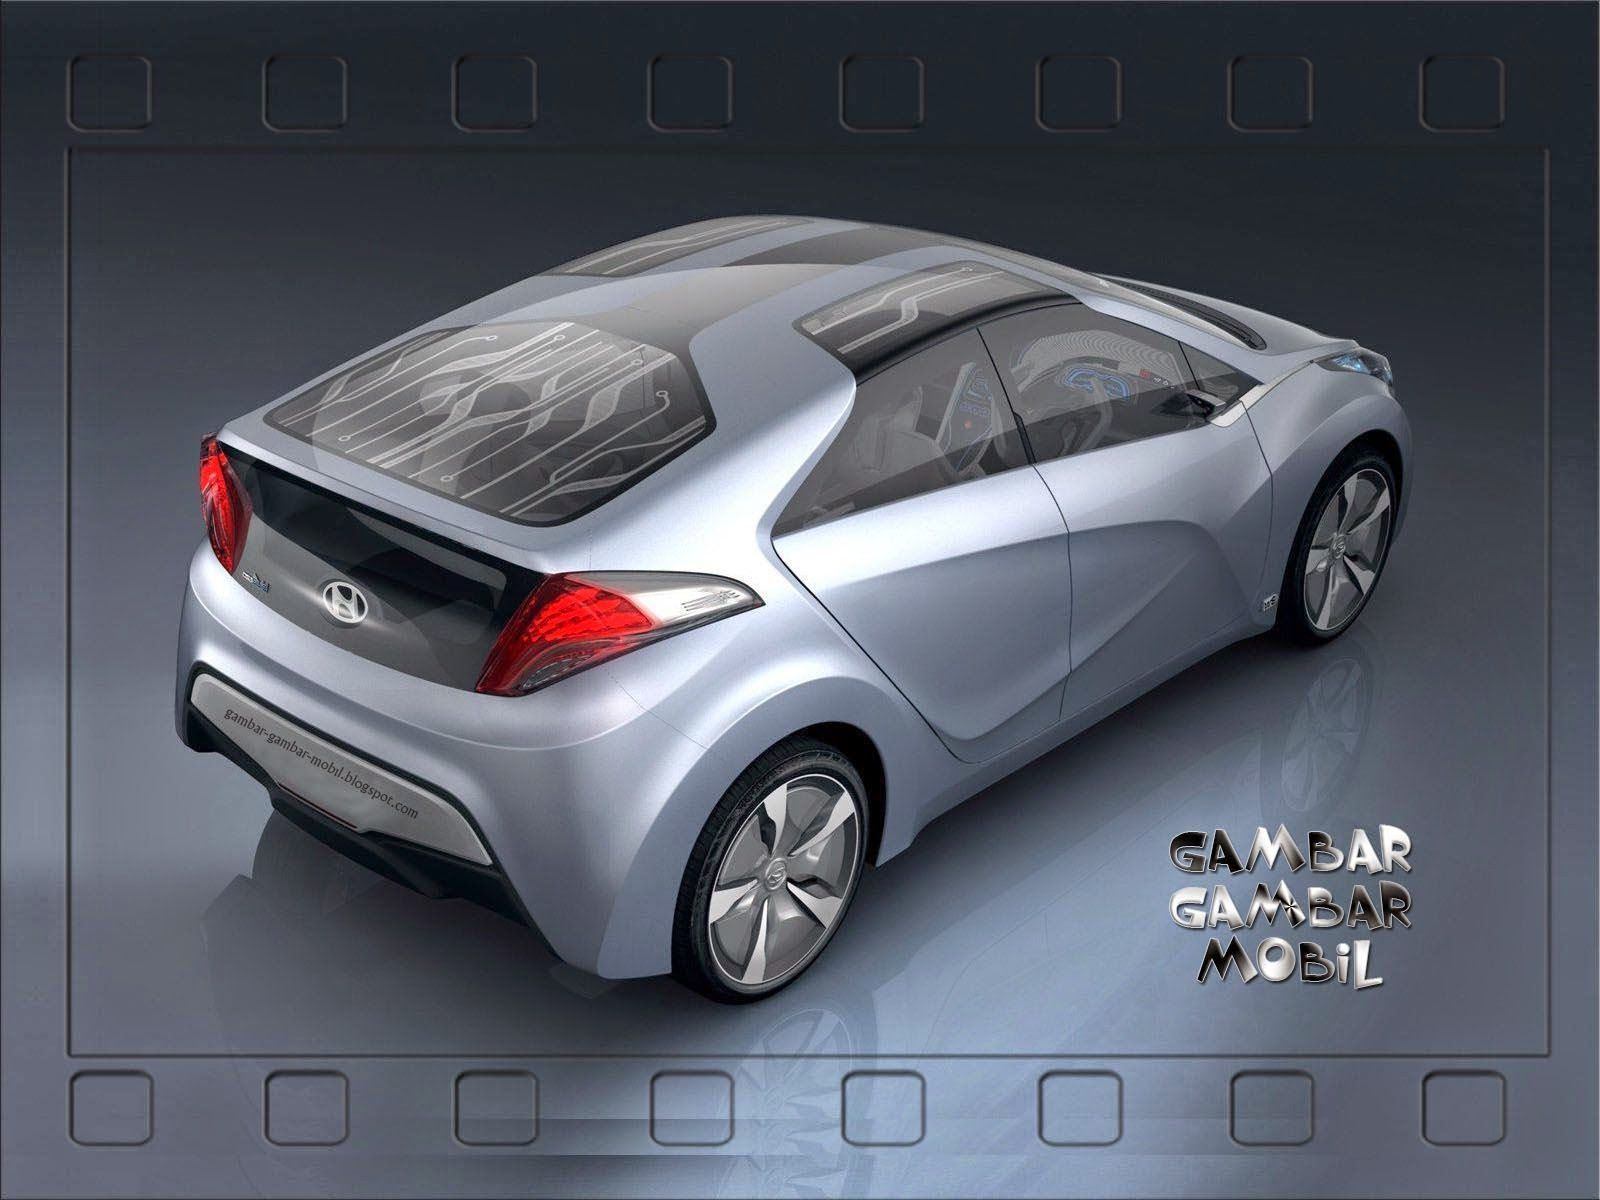 Gambar Mobil Hyundai Gambar Gambar Mobil Mobil Mobil Baru Gambar